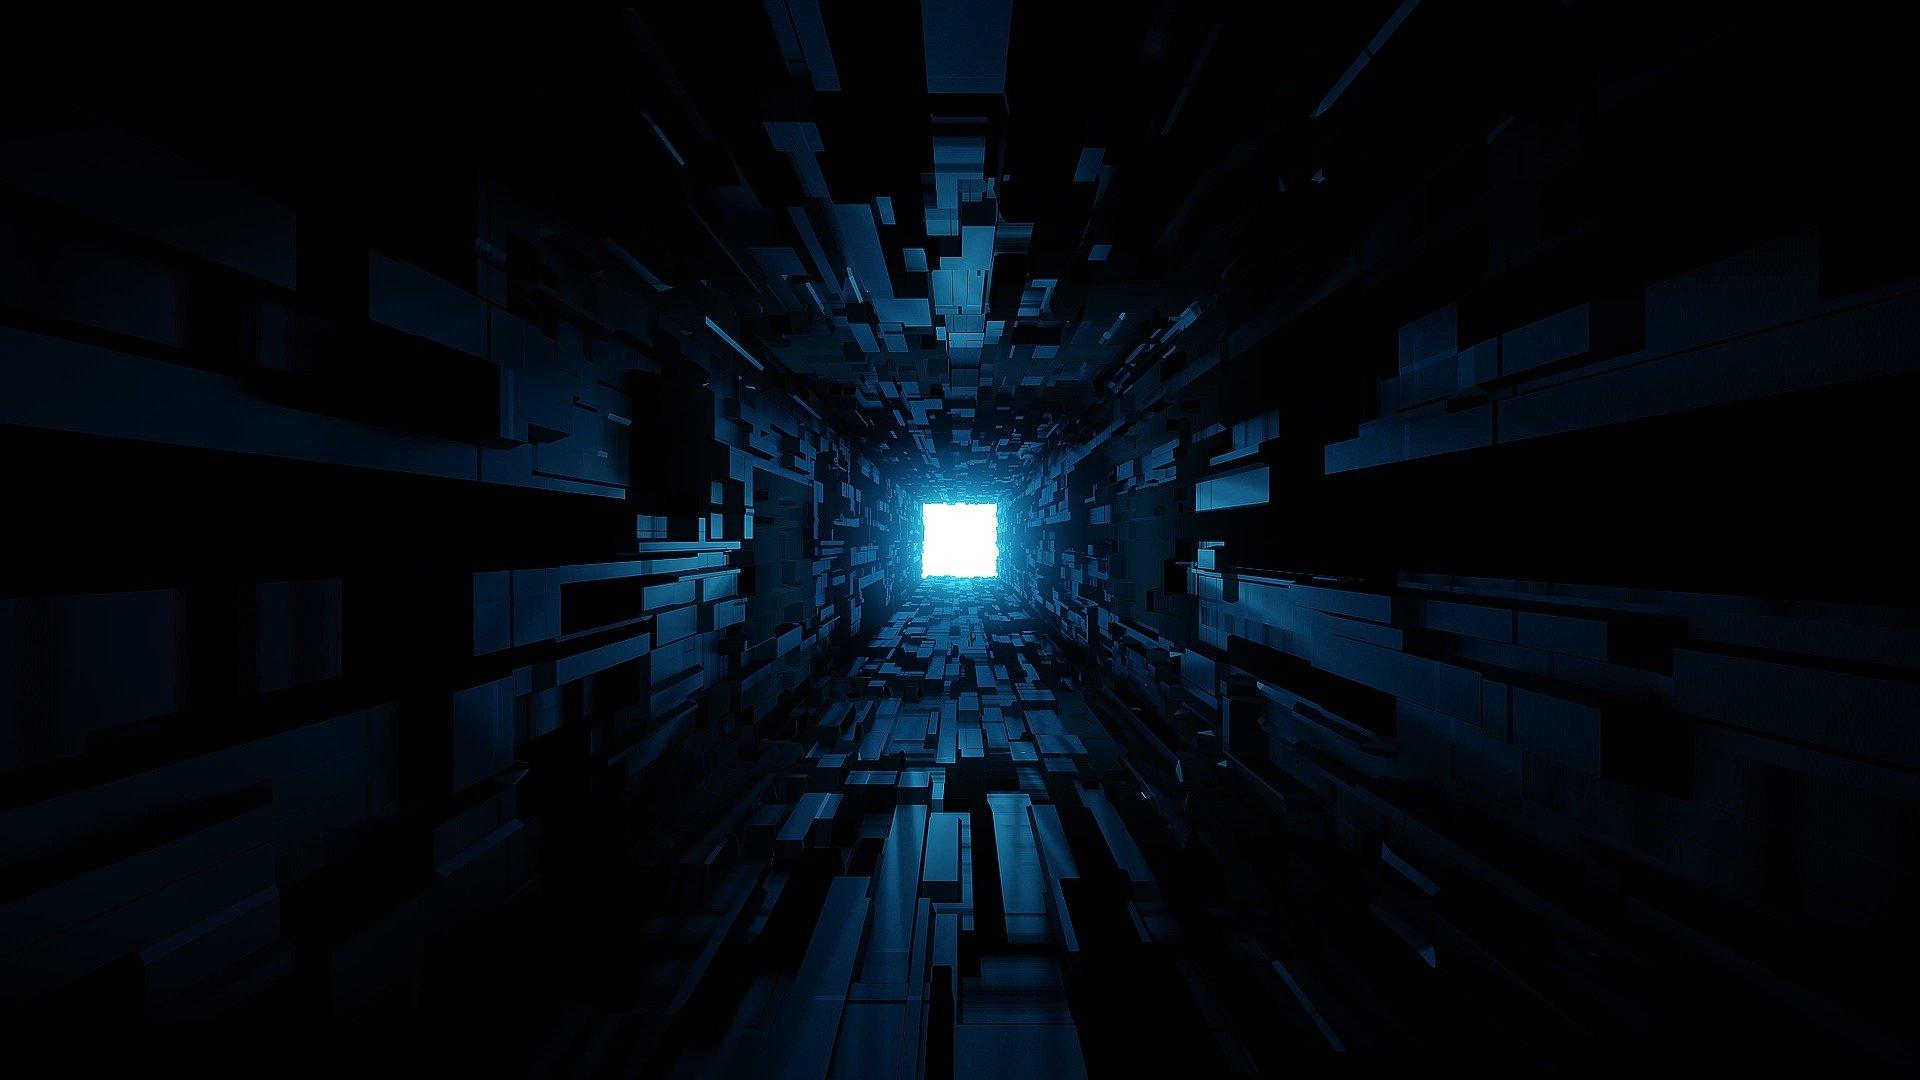 Light At The End Of A Dark Tunnel Fondo De Pantalla Hd